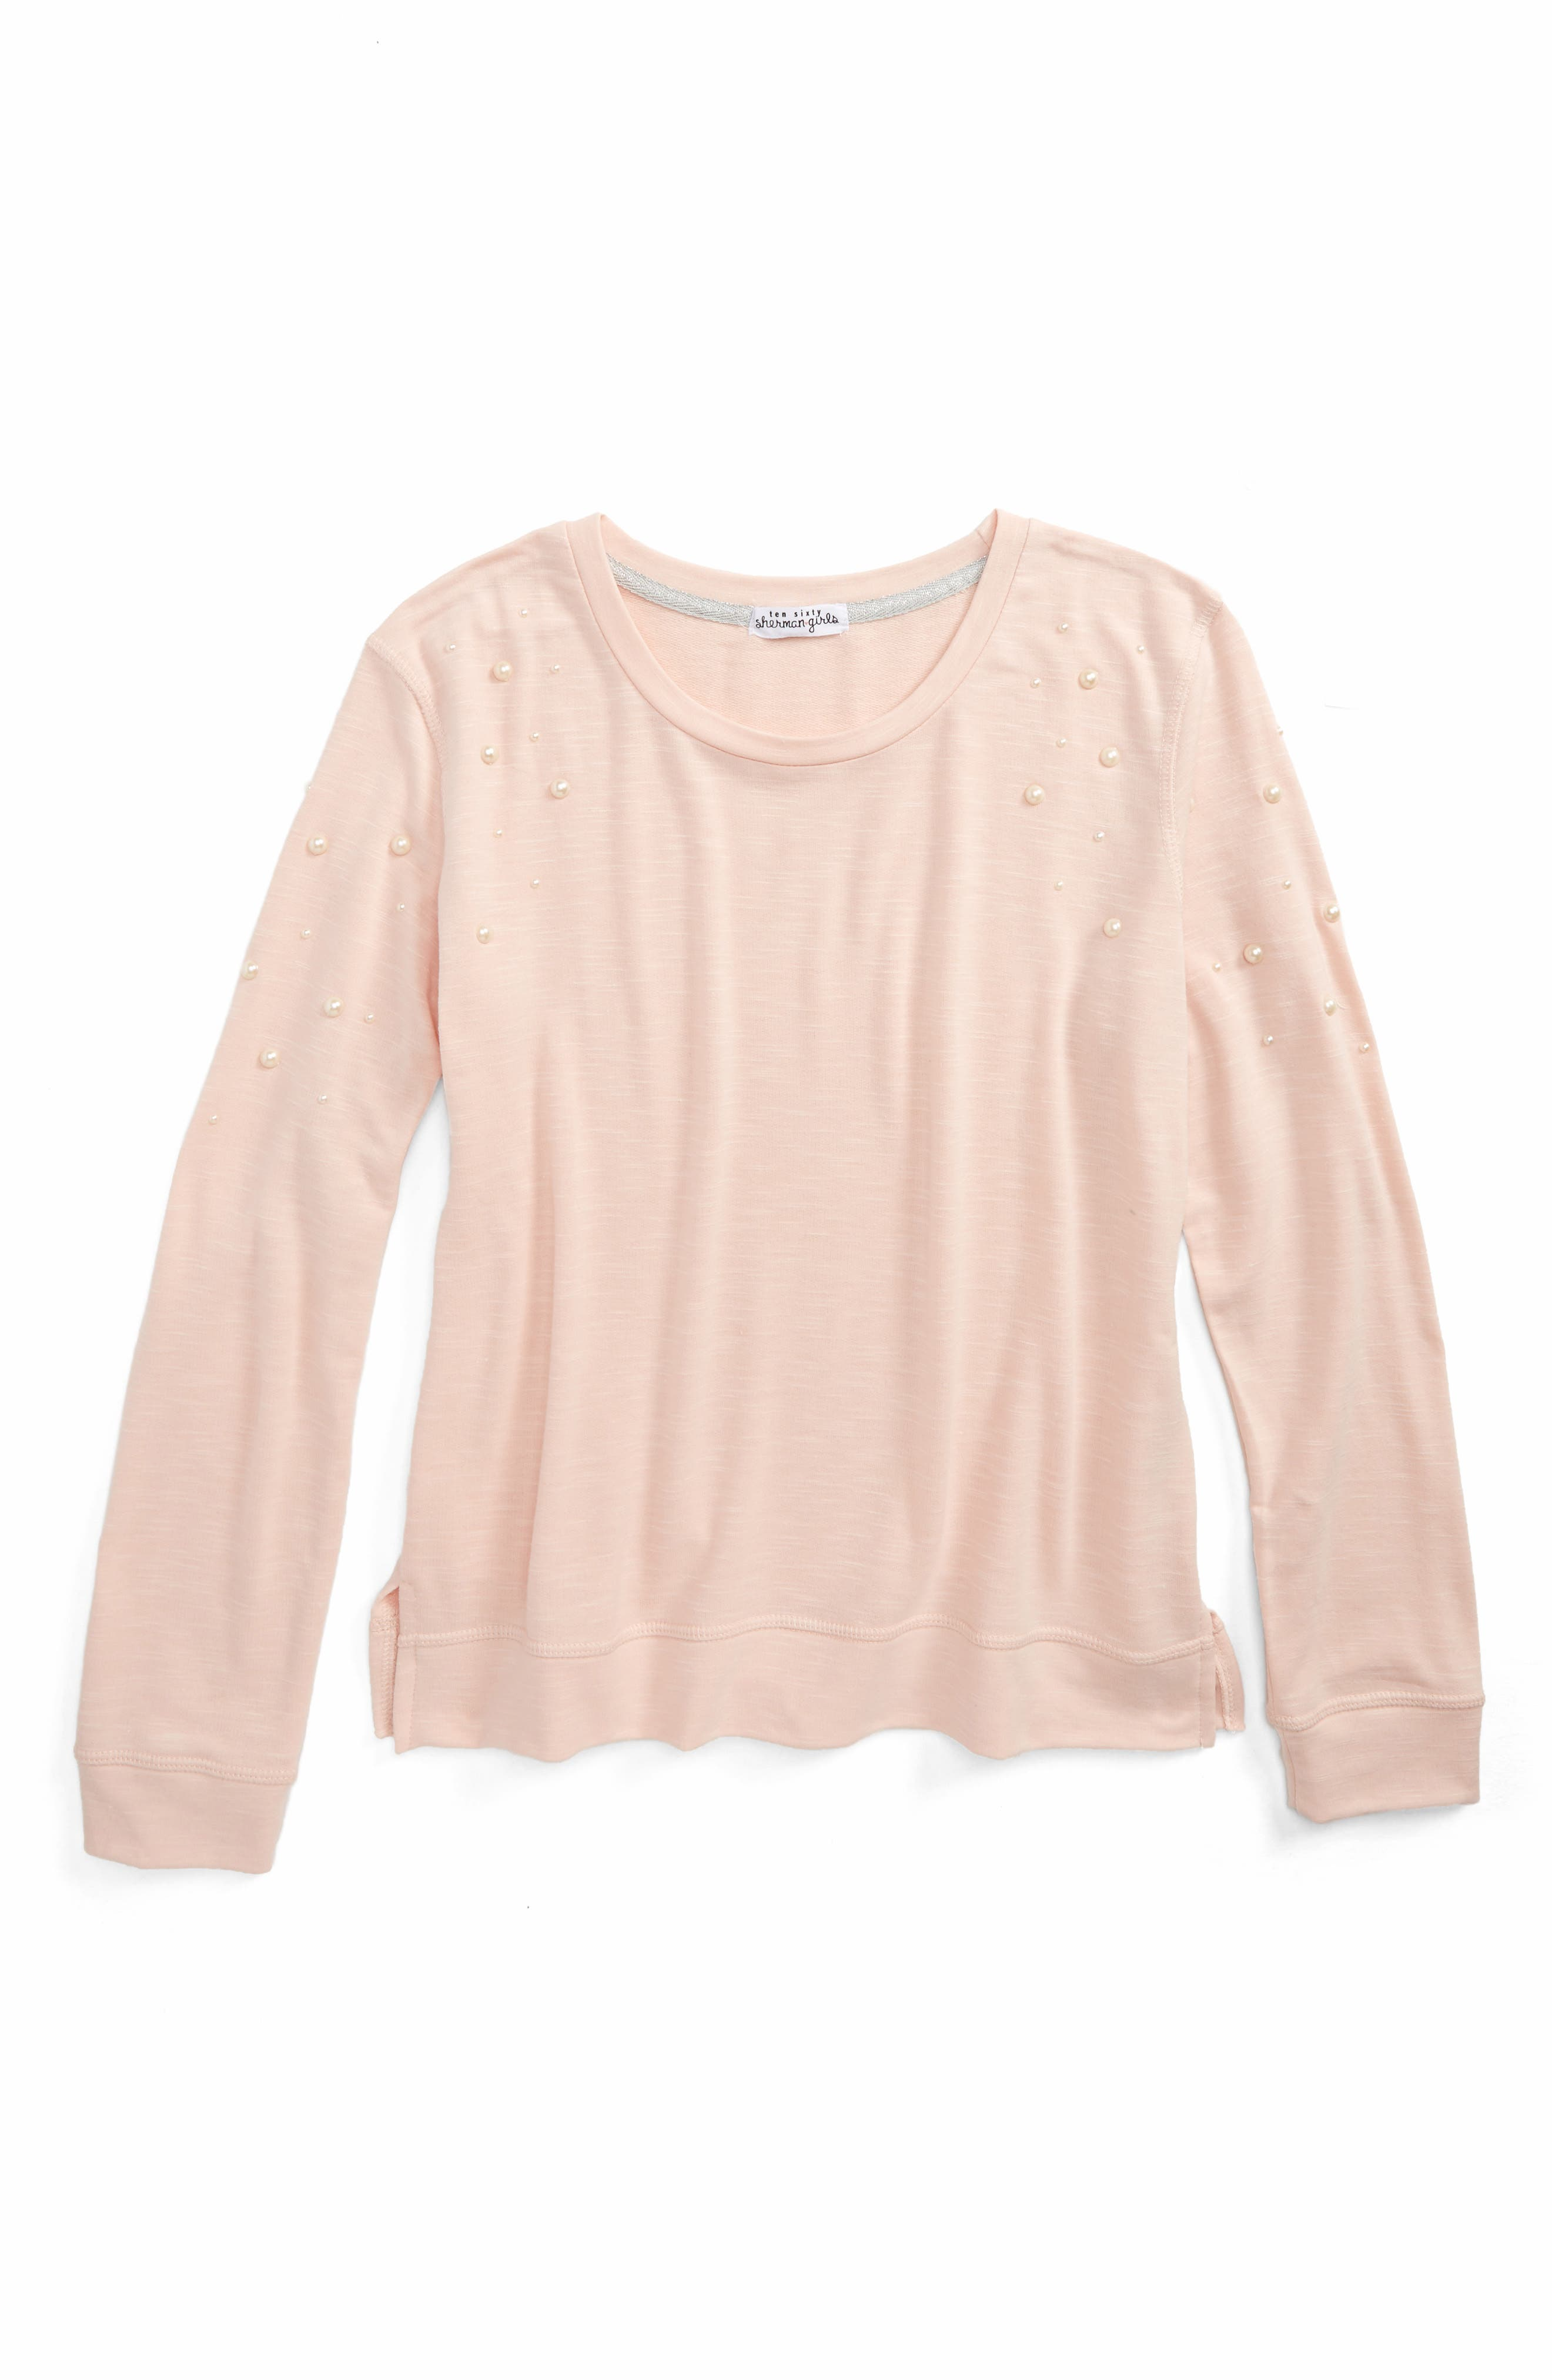 Main Image - Ten Sixty Sherman Imitation Pearl Embellished Sweatshirt (Big Girls)